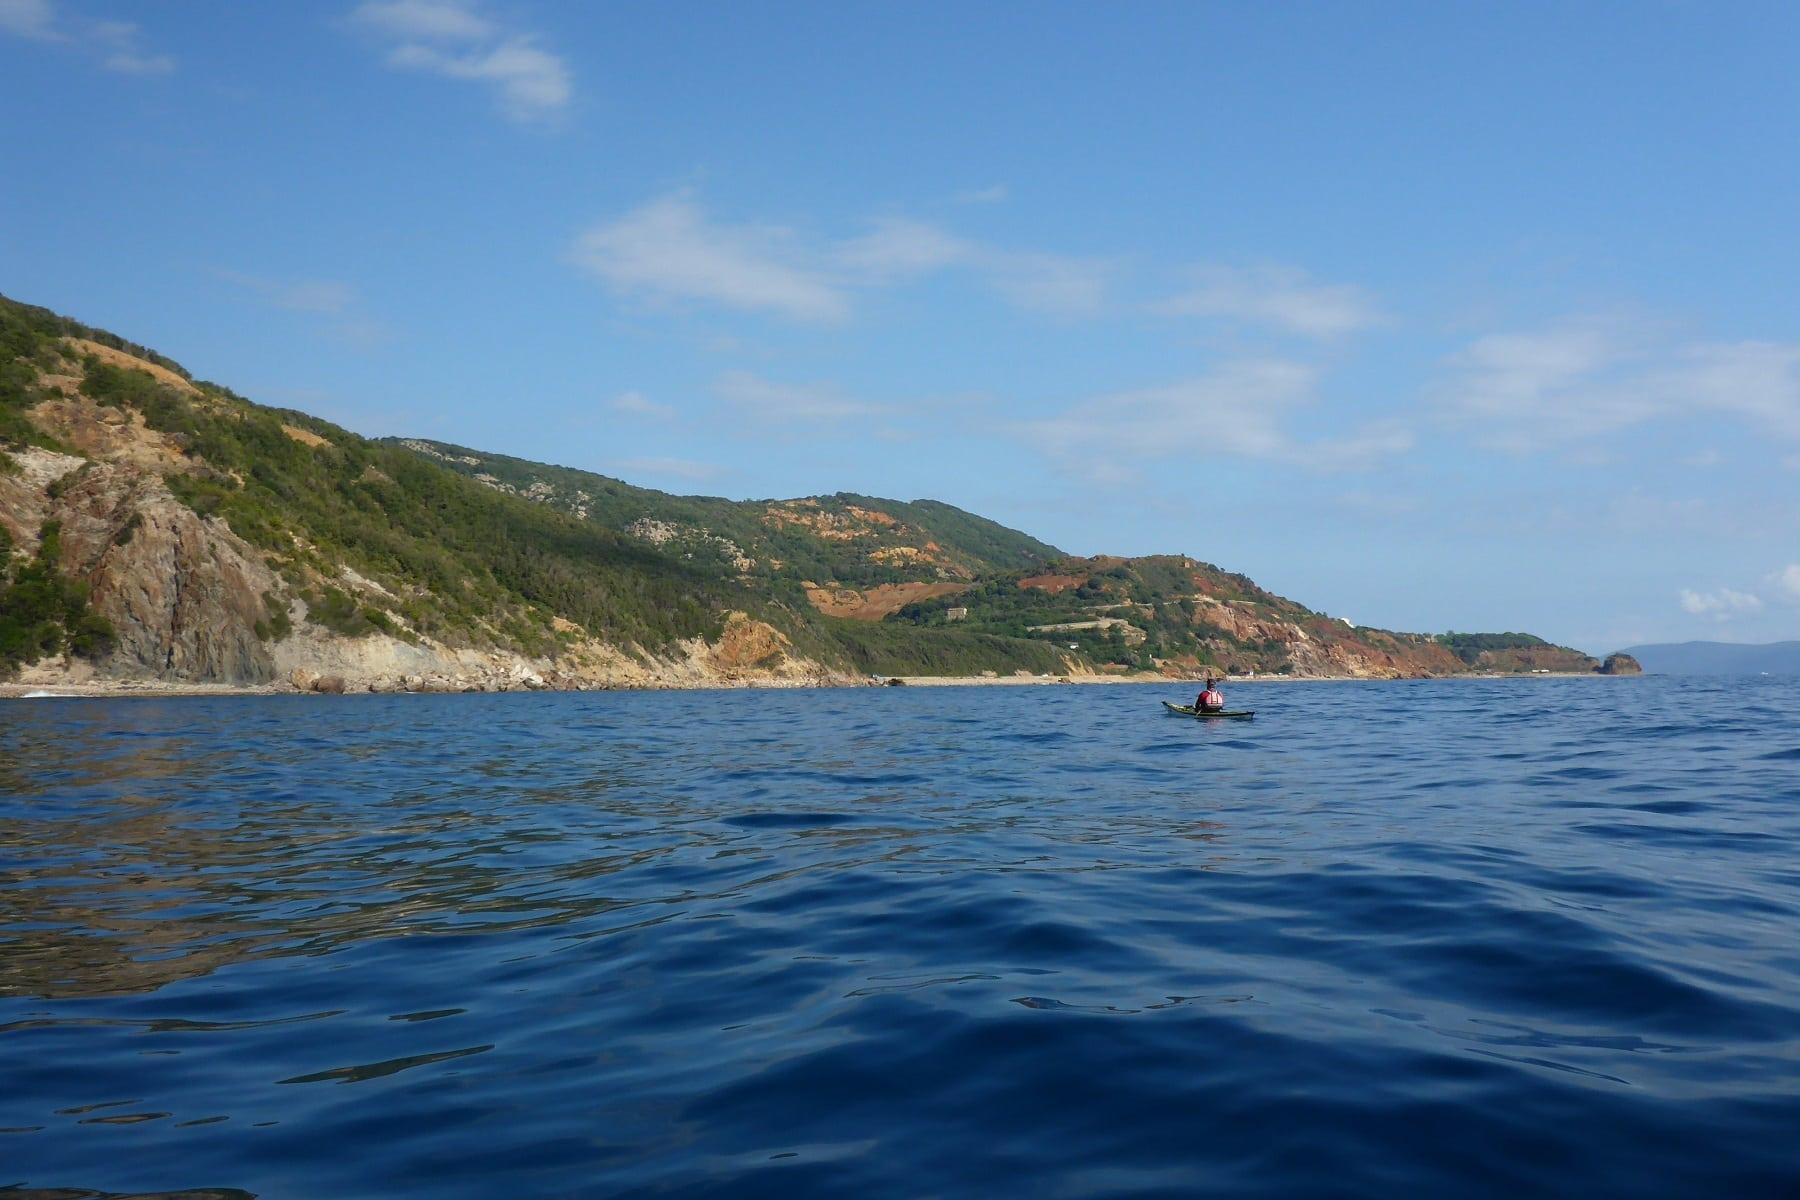 mit dem Seekajak an der Ostkueste Elbas